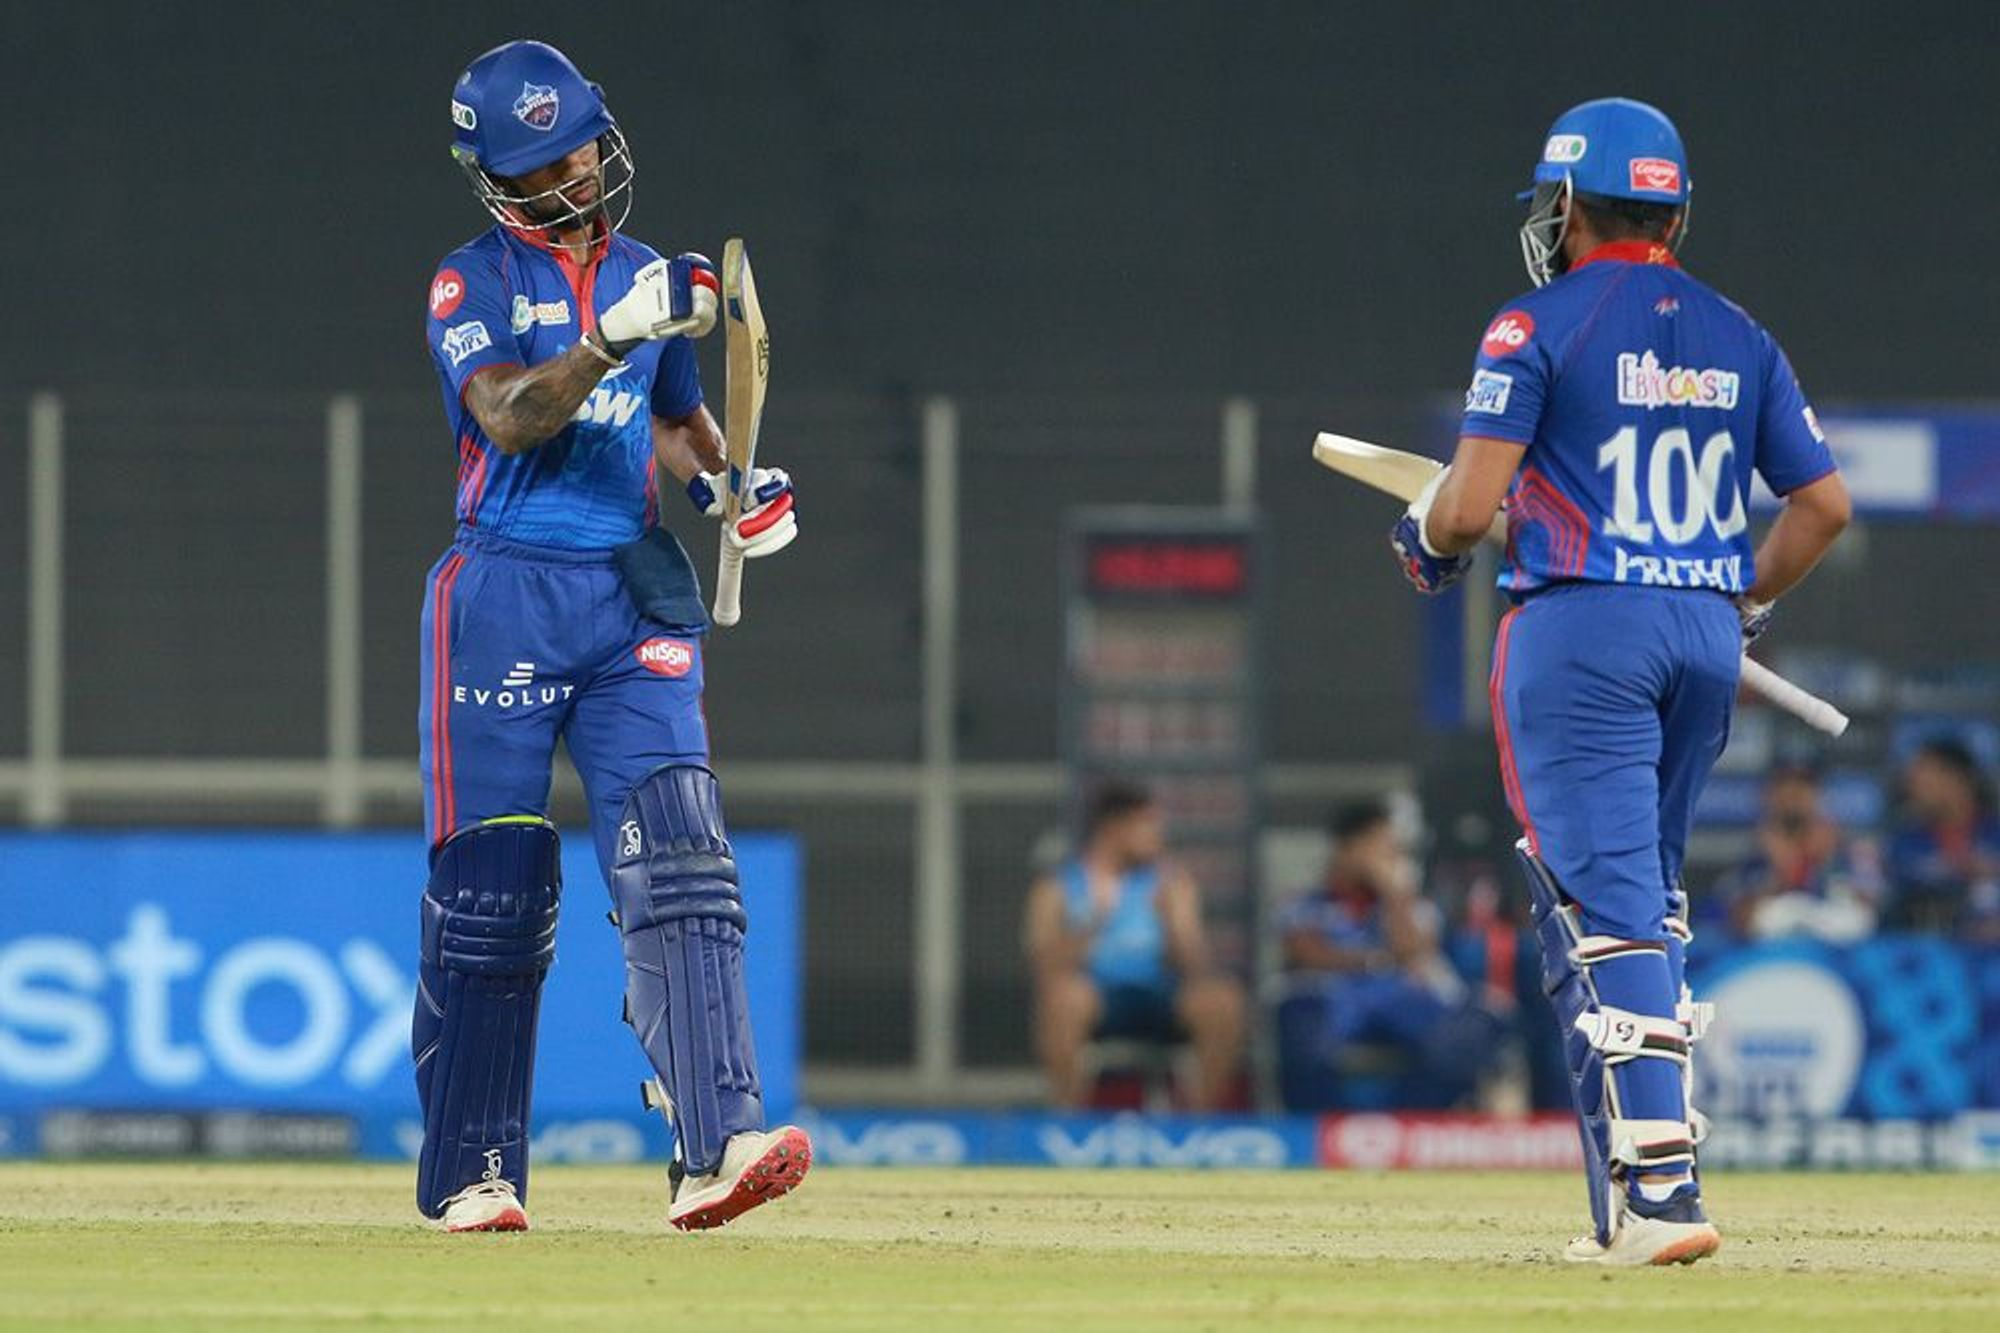 Shikhar Dhawan and Prithvi Shaw | BCCI/IPL